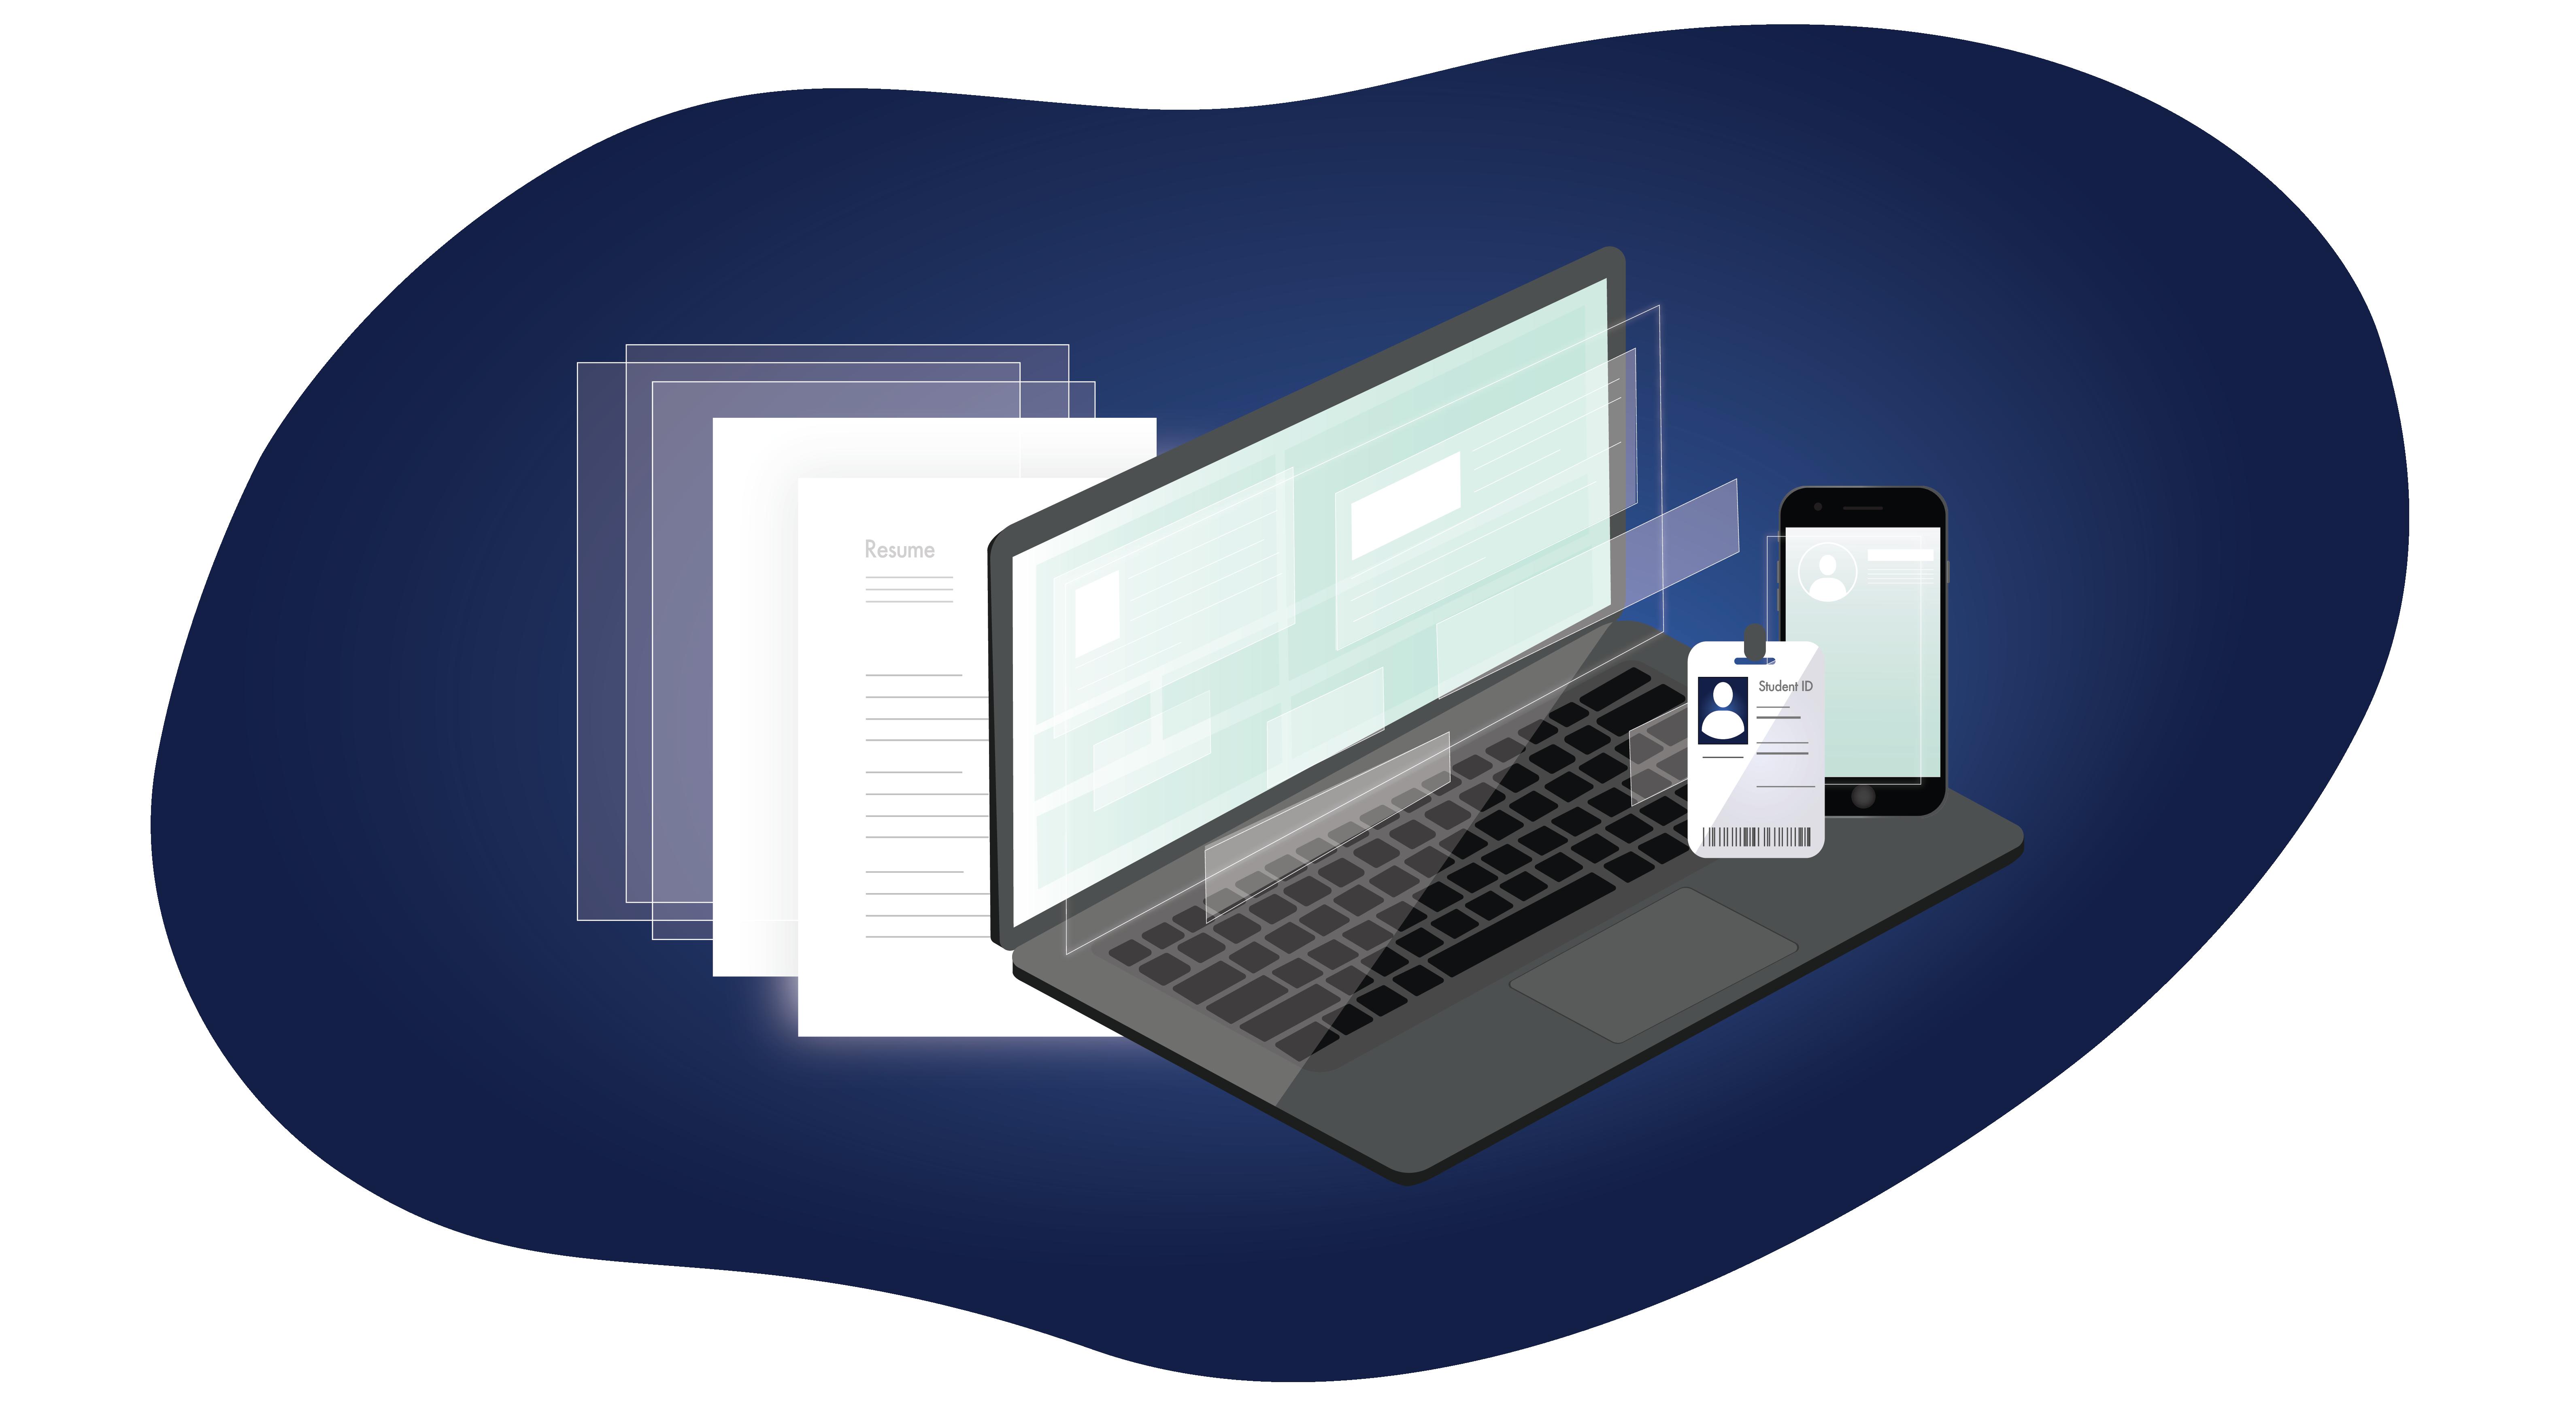 healthcare documents, ID, illustration